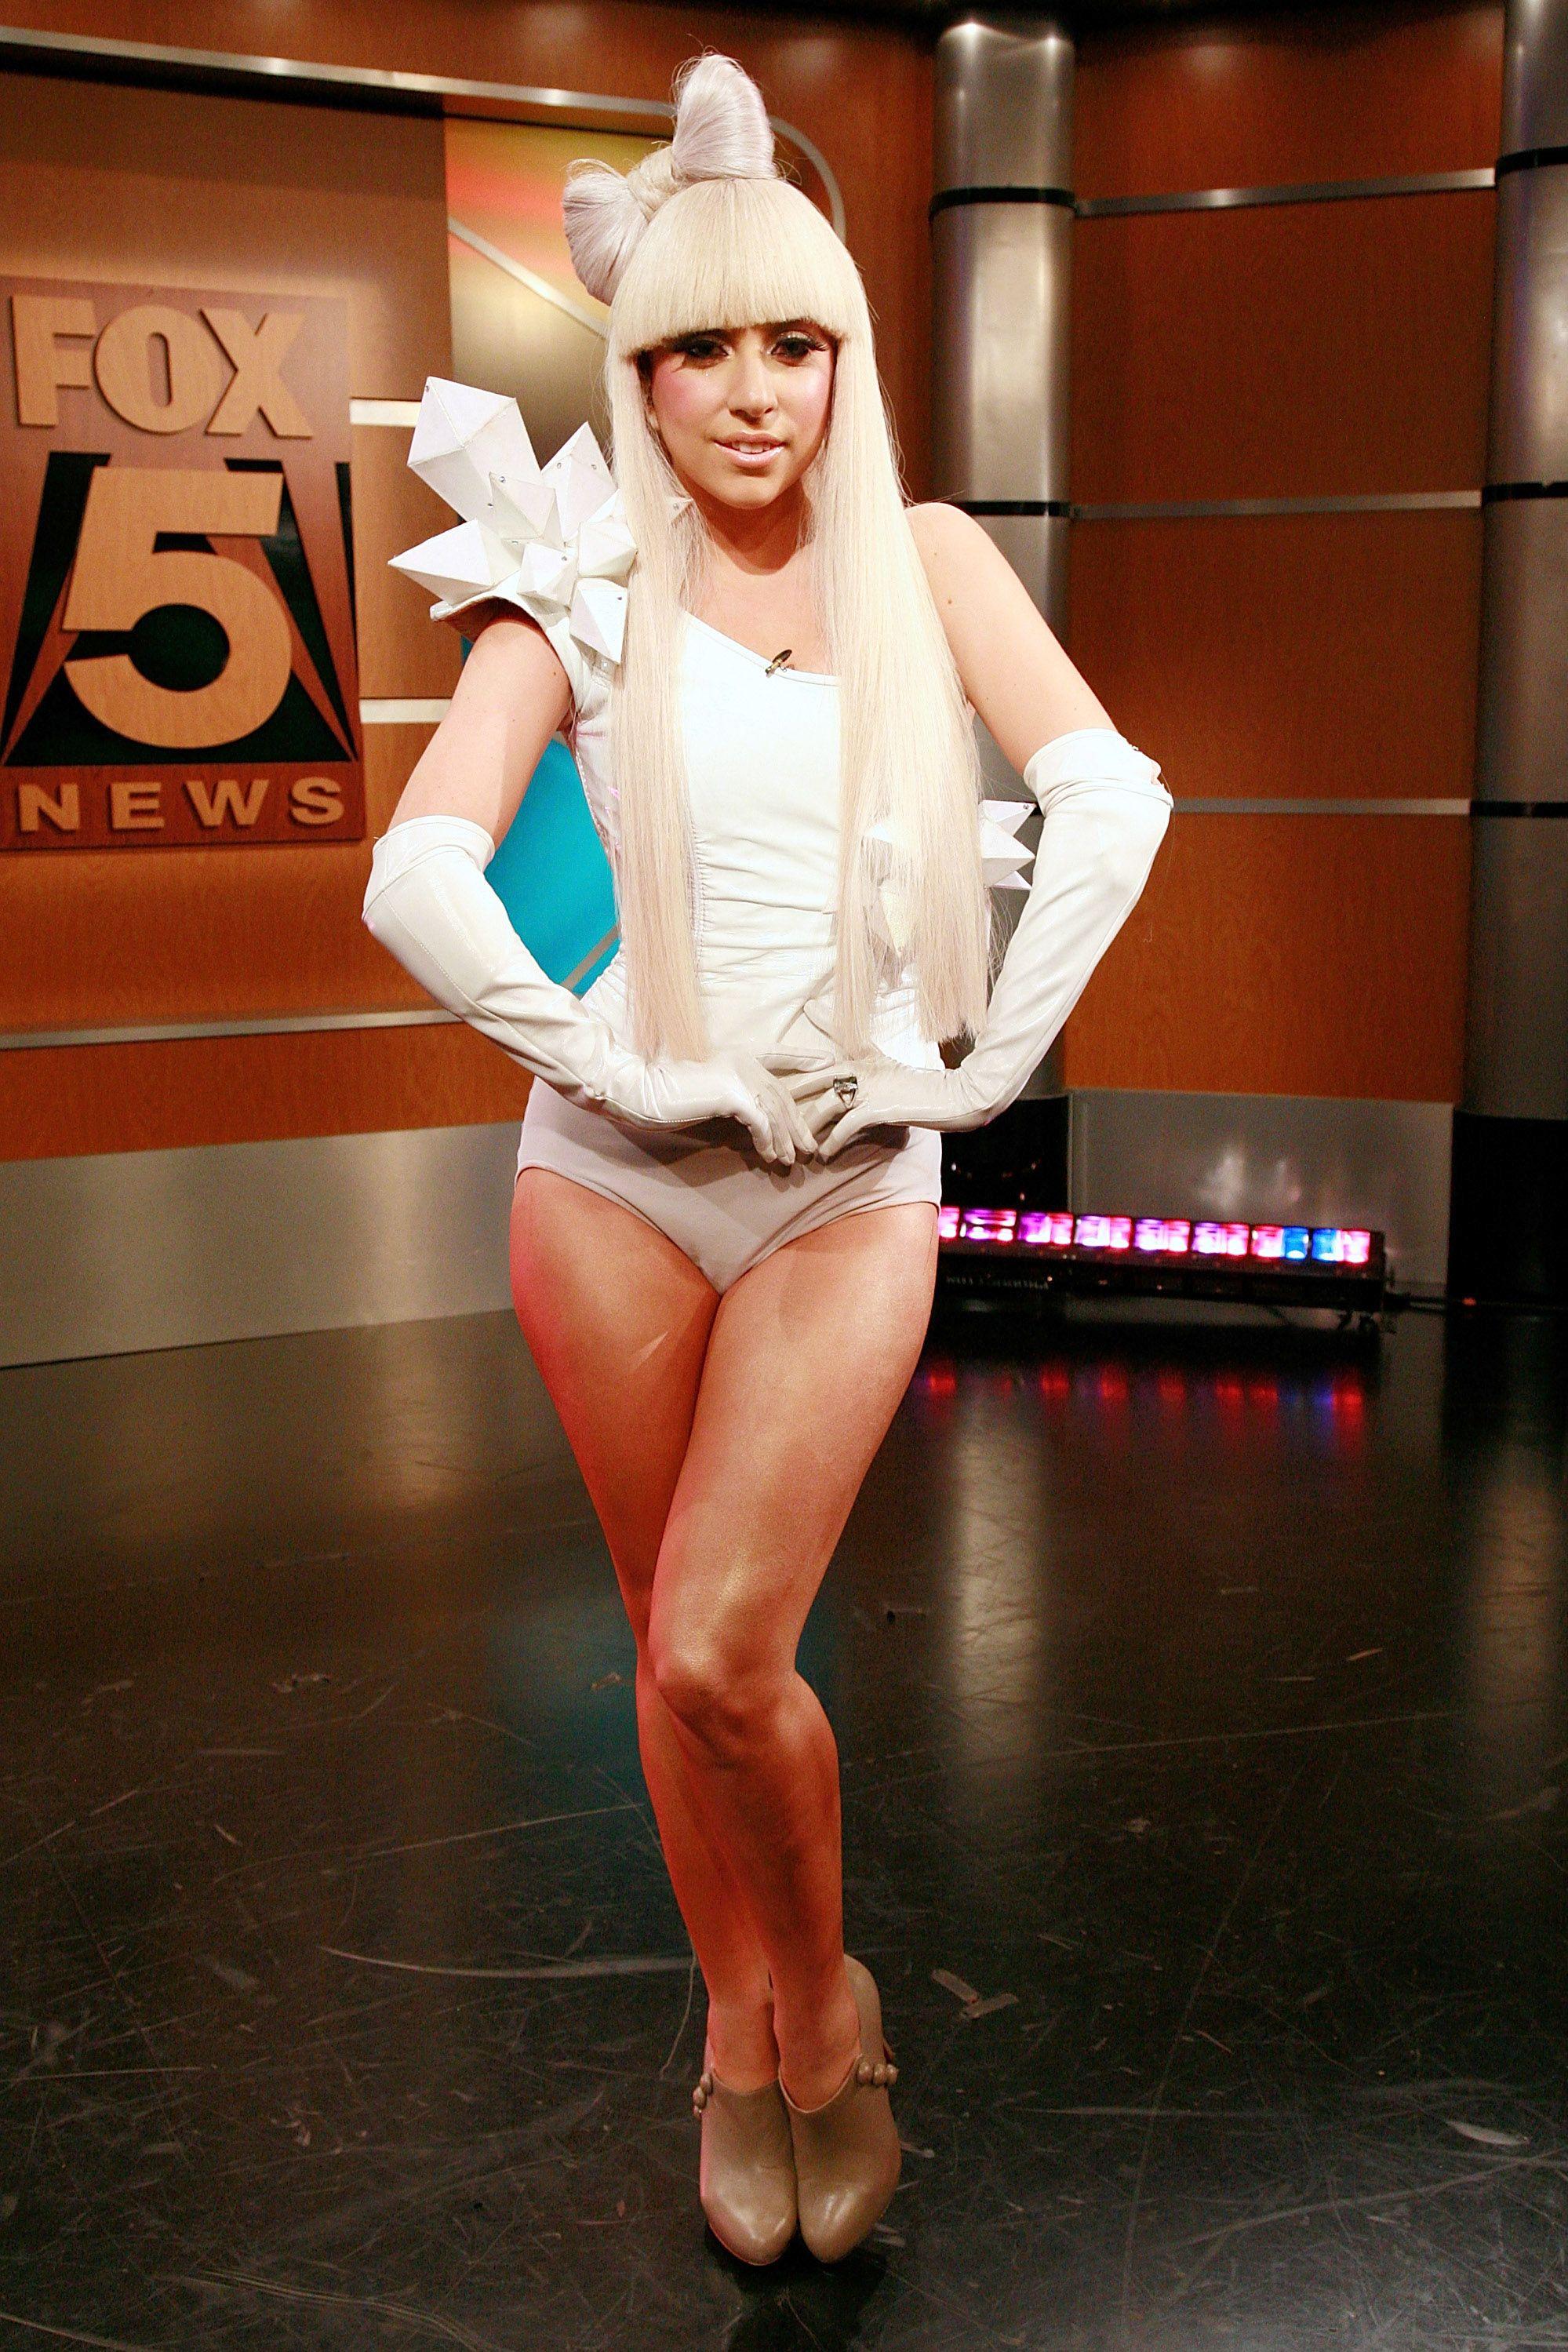 Lady Gaga and Chris Jericho Visit FOX's 'Good Day New York' - Octobe